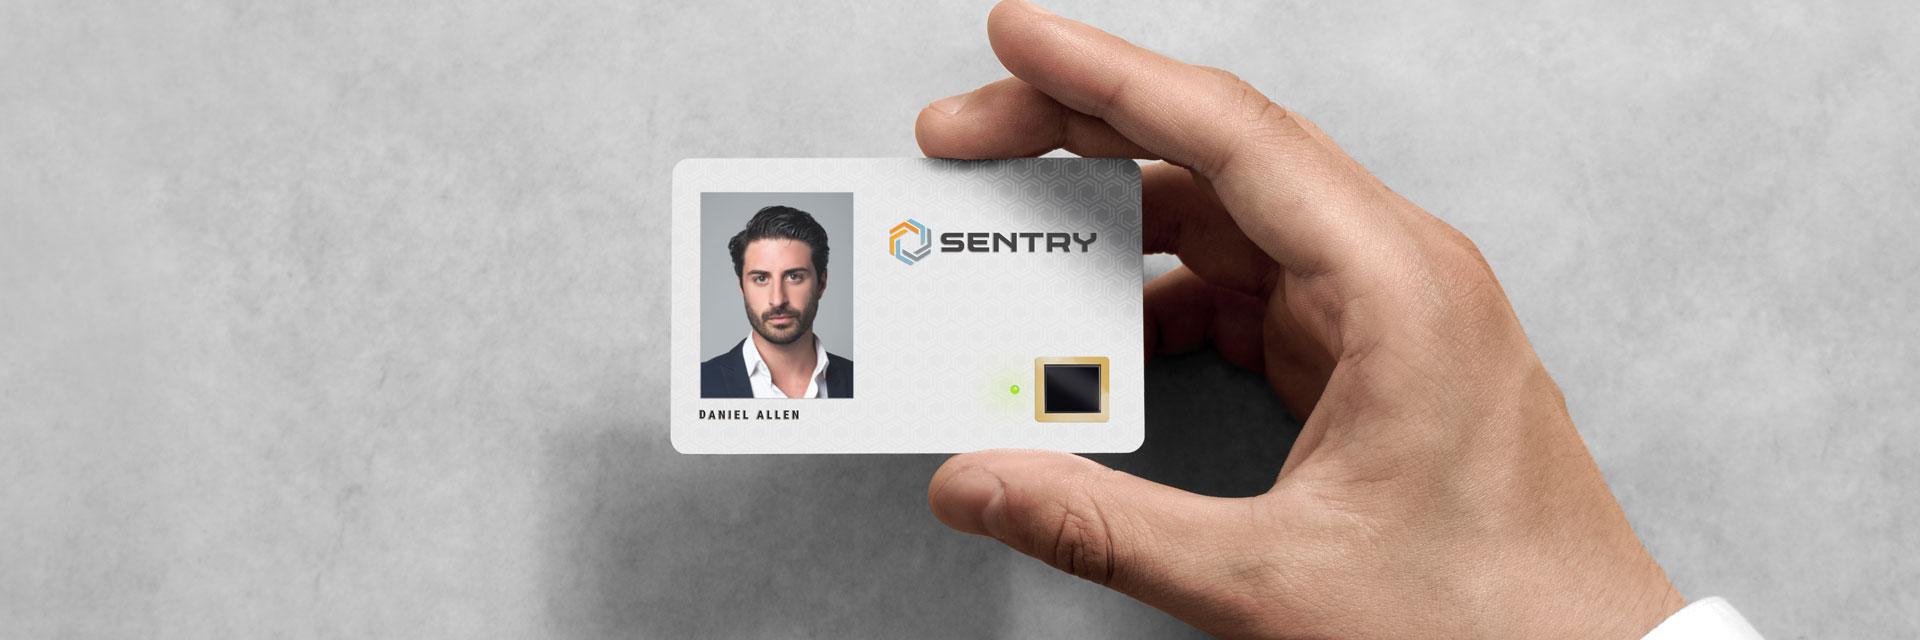 Introducing The SentryCard